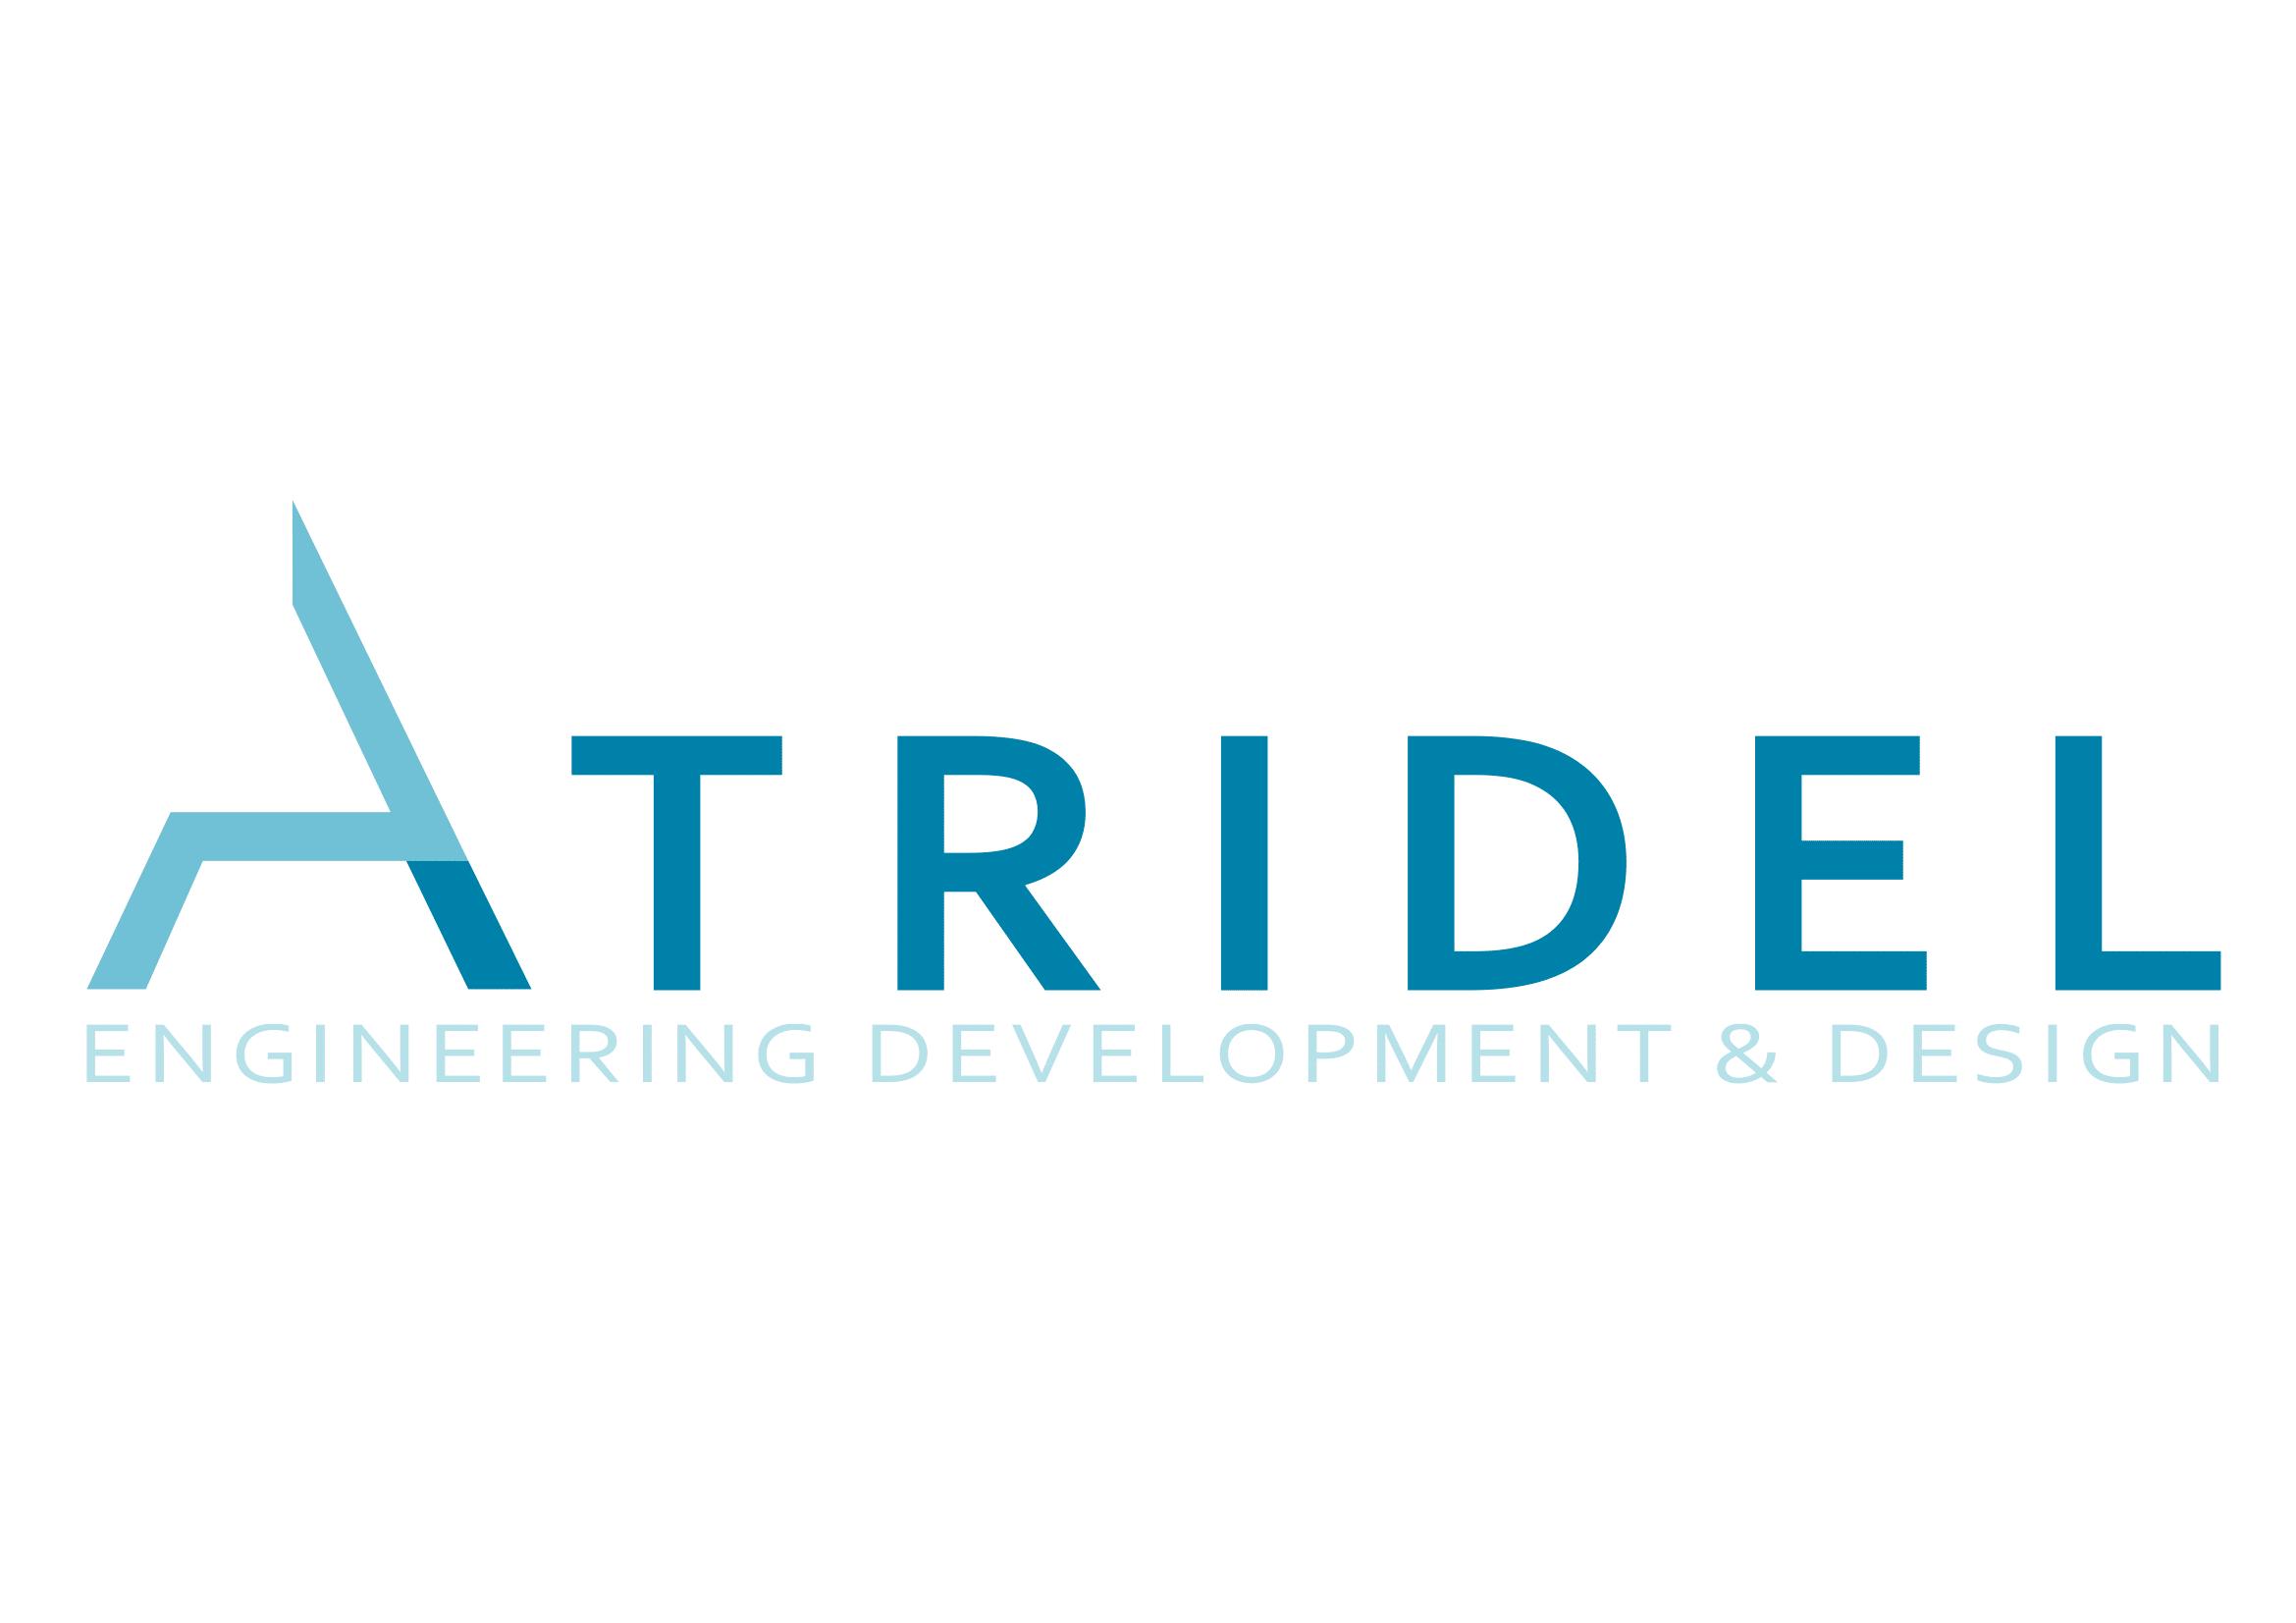 ATRIDEL Engineering Development & Desing